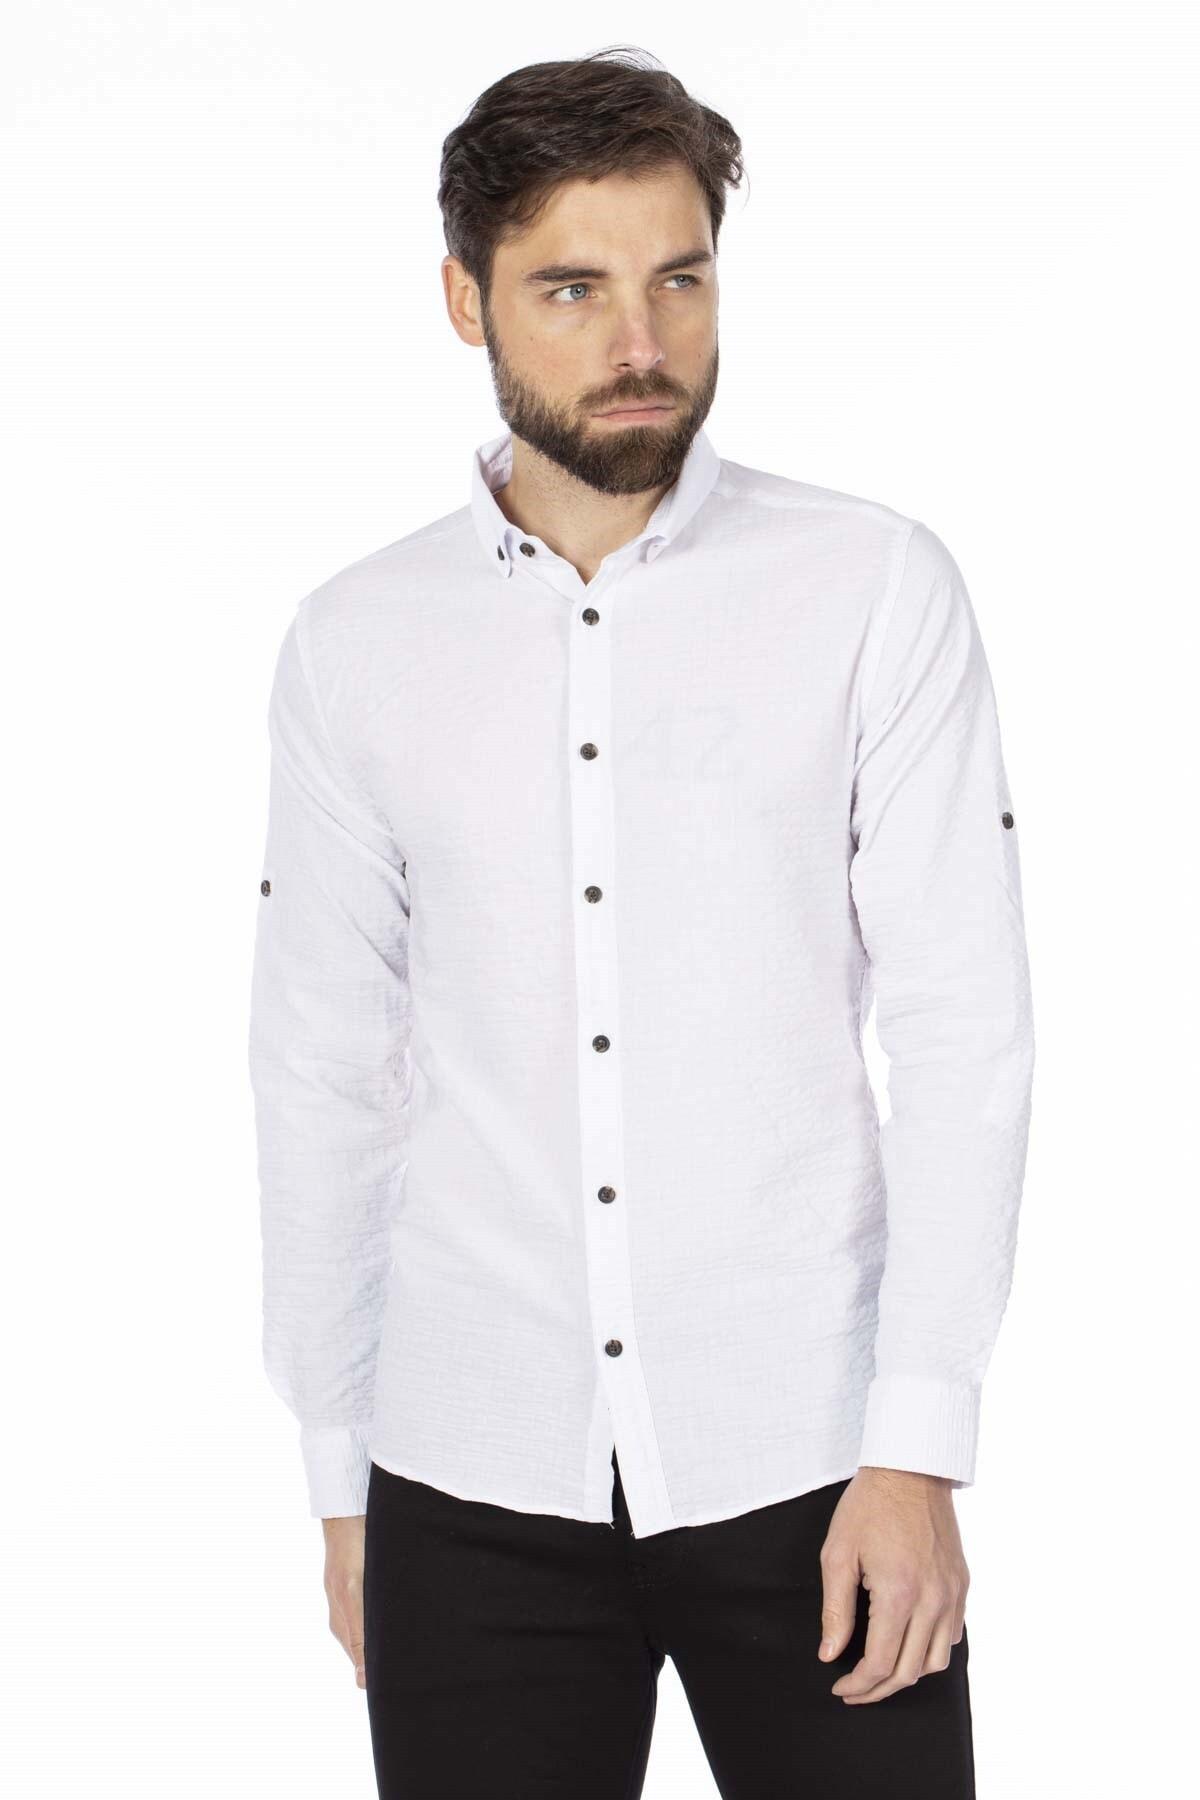 BARRELS AND OIL Erkek Beyaz Bengalin Gömlek 344-20Y03010.55